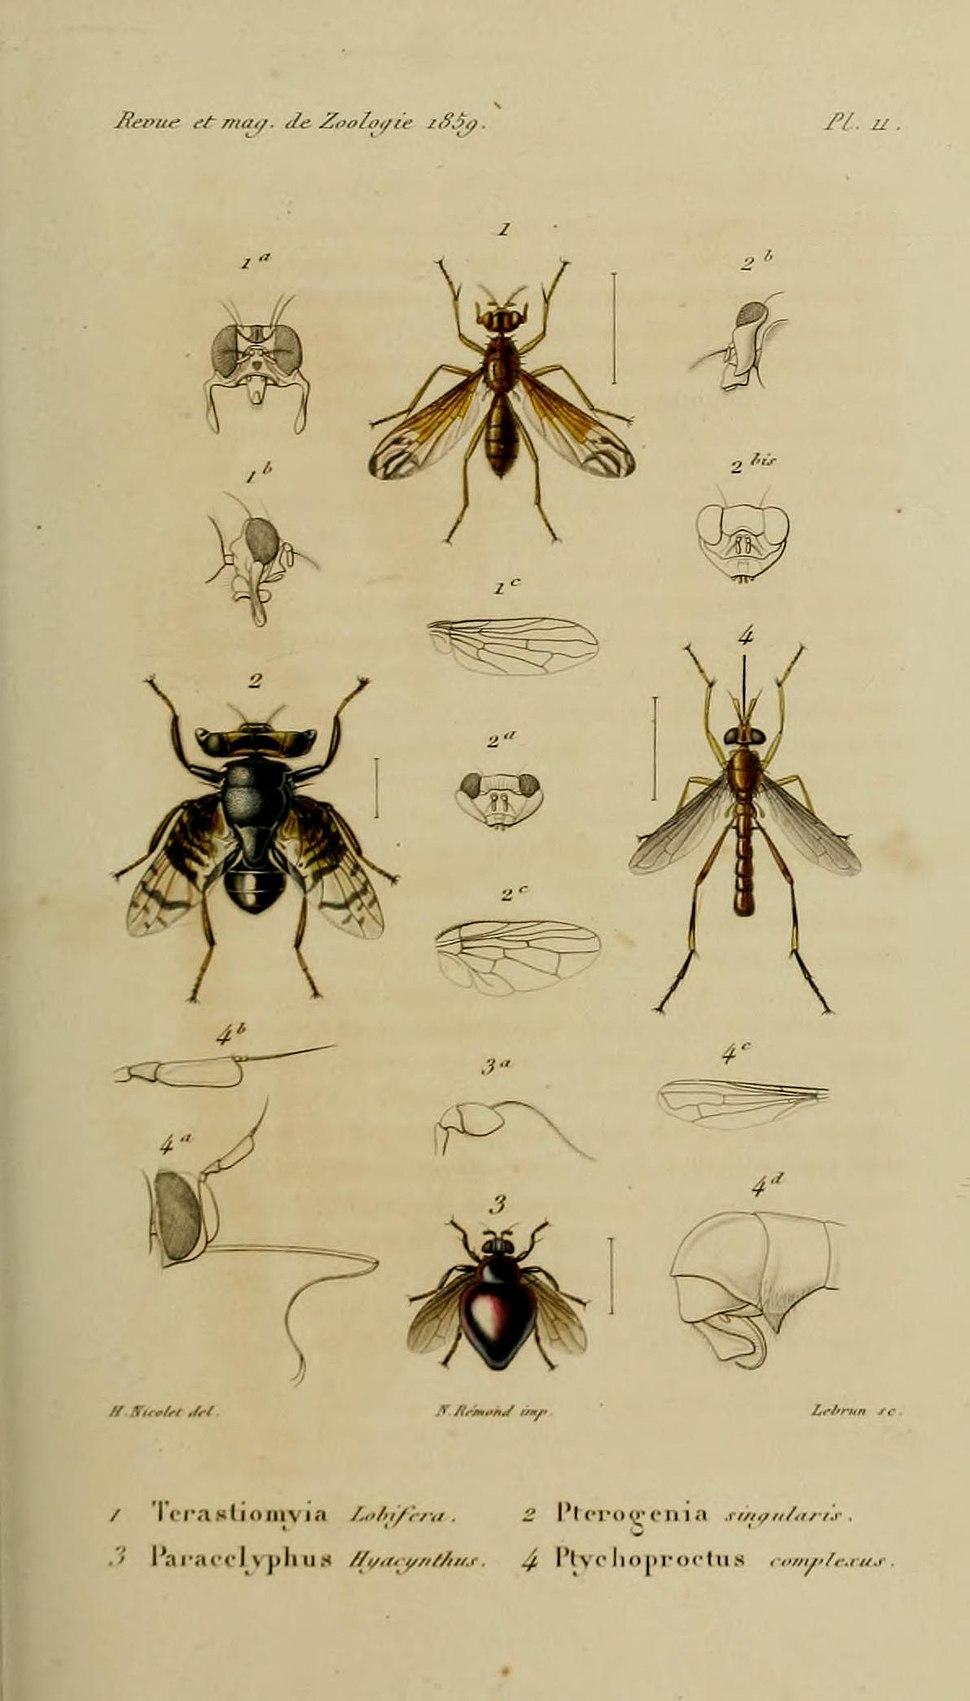 Plate from Revue et Magasin de Zoologie depicting Pterogenia singularis Bigot, 1859